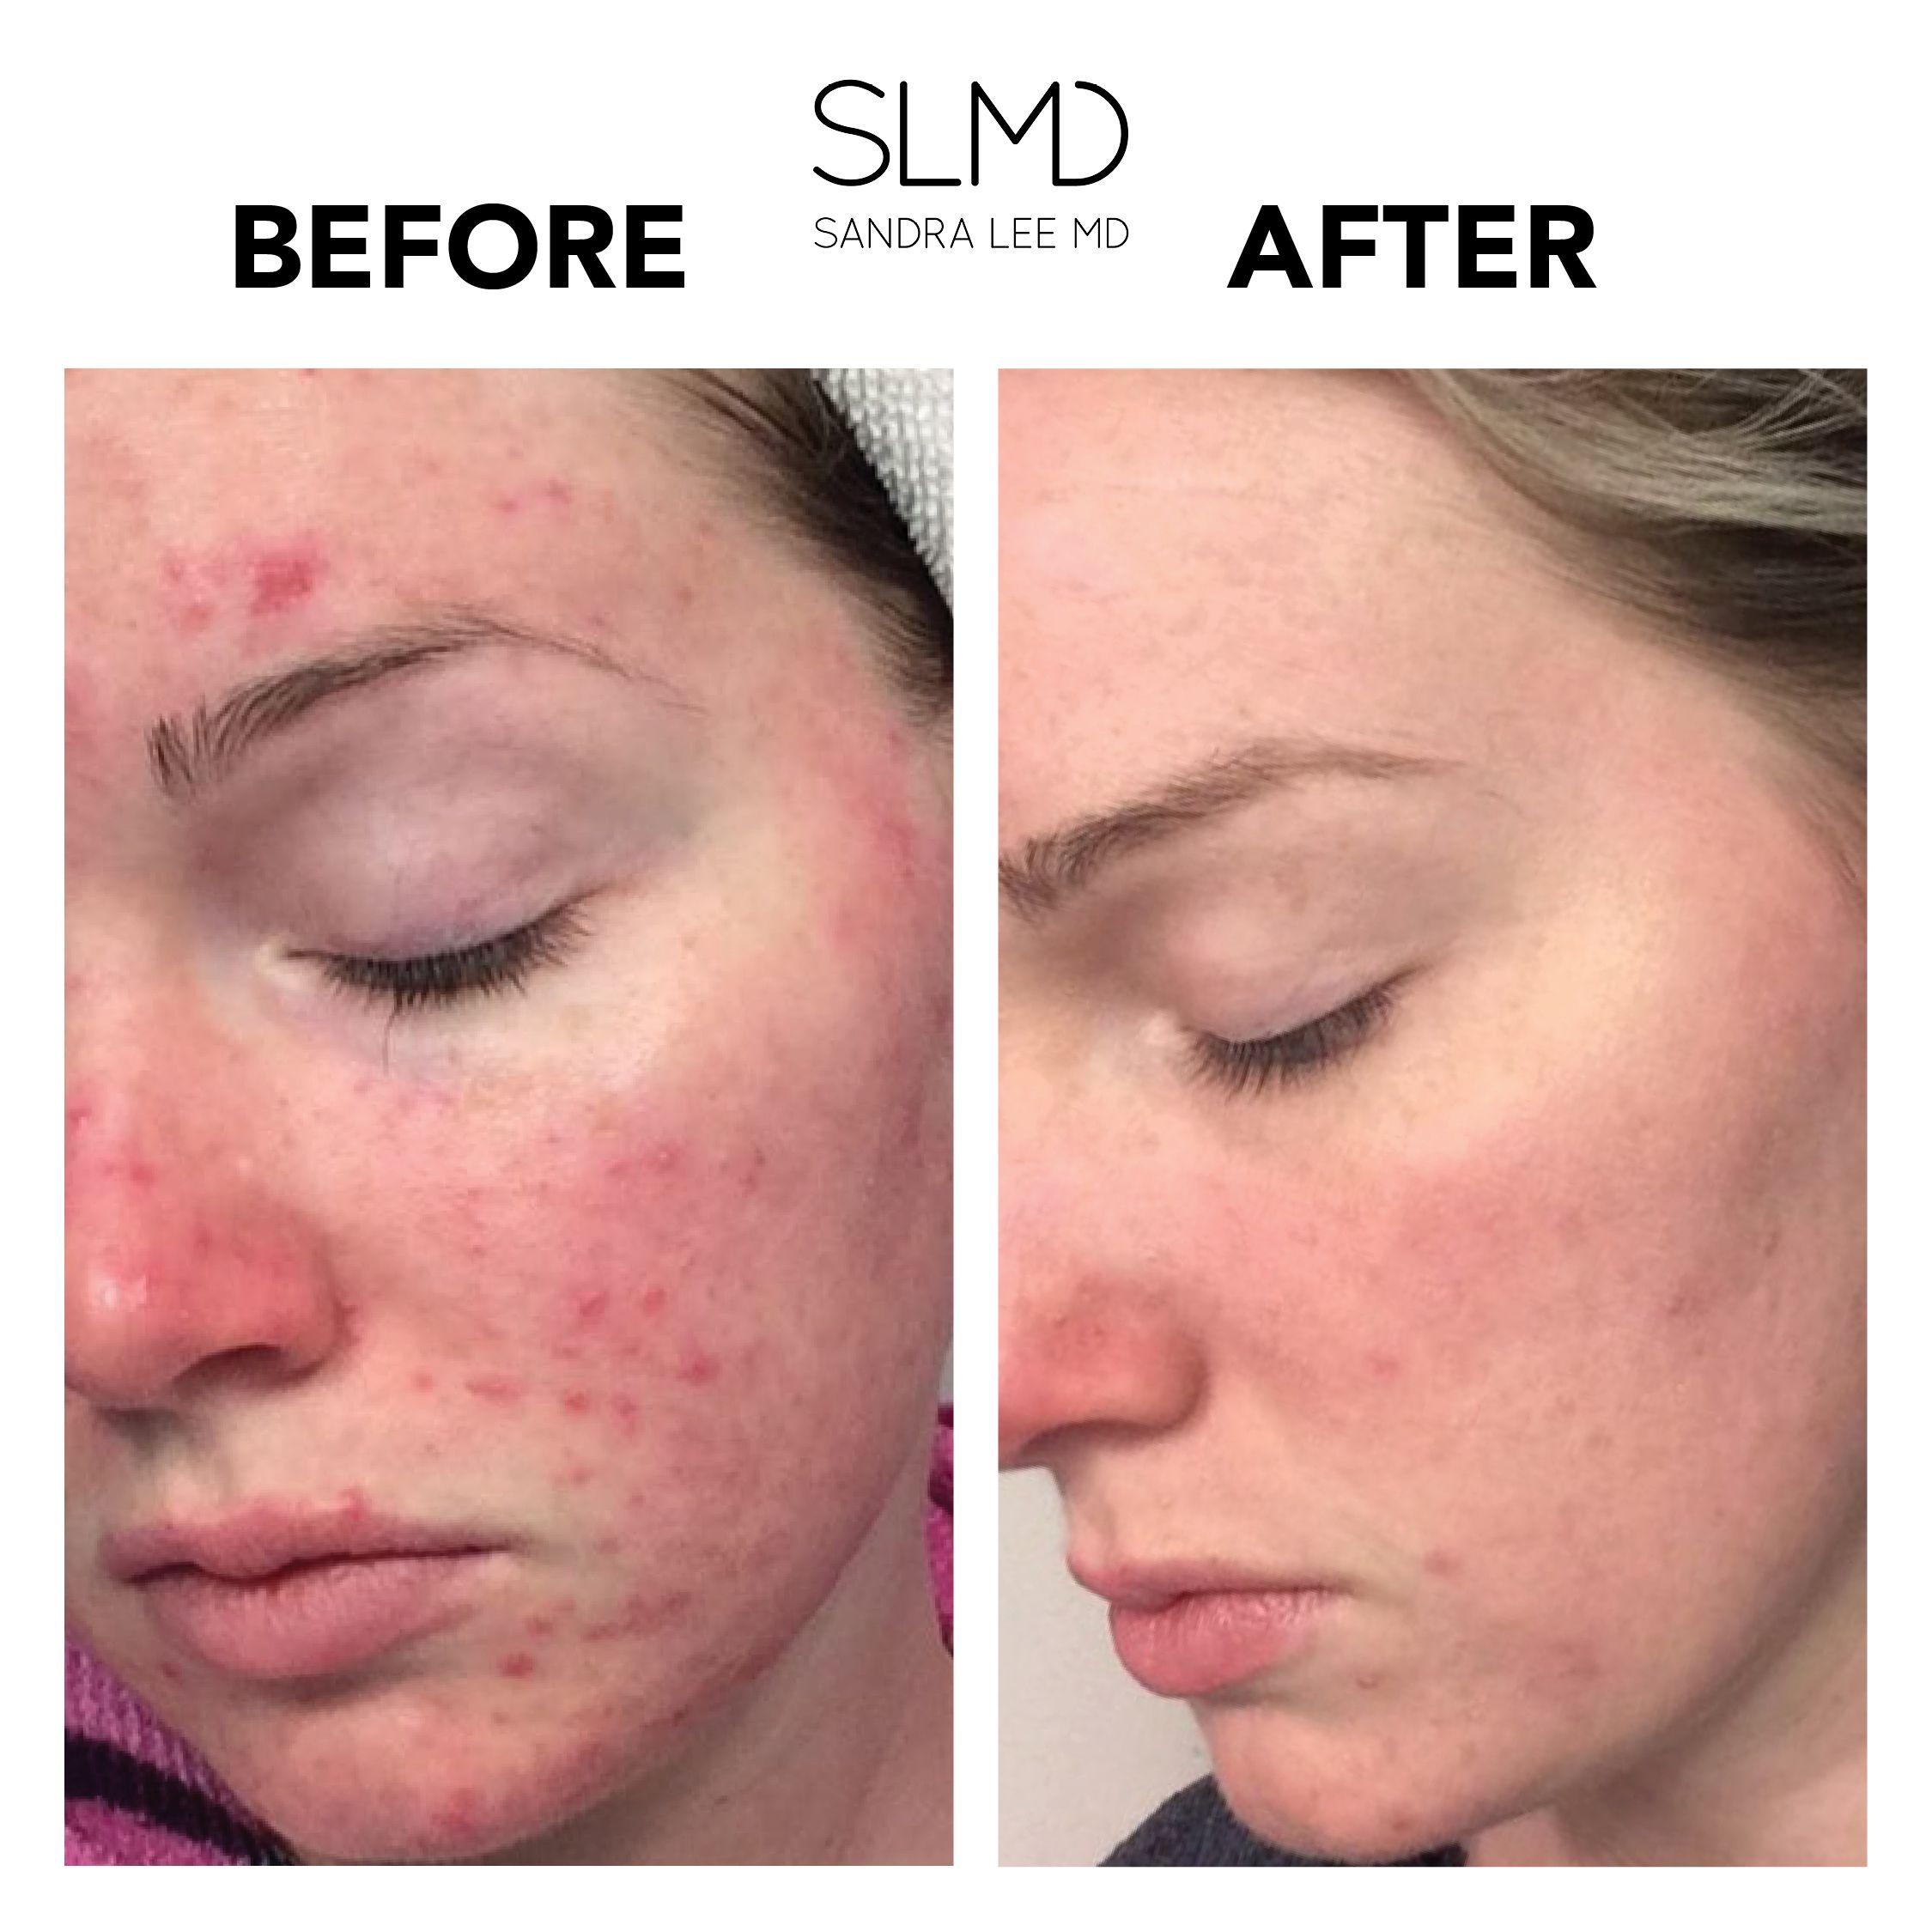 Acne System Simple Skincare Facial Moisturizers Skin Care Tips